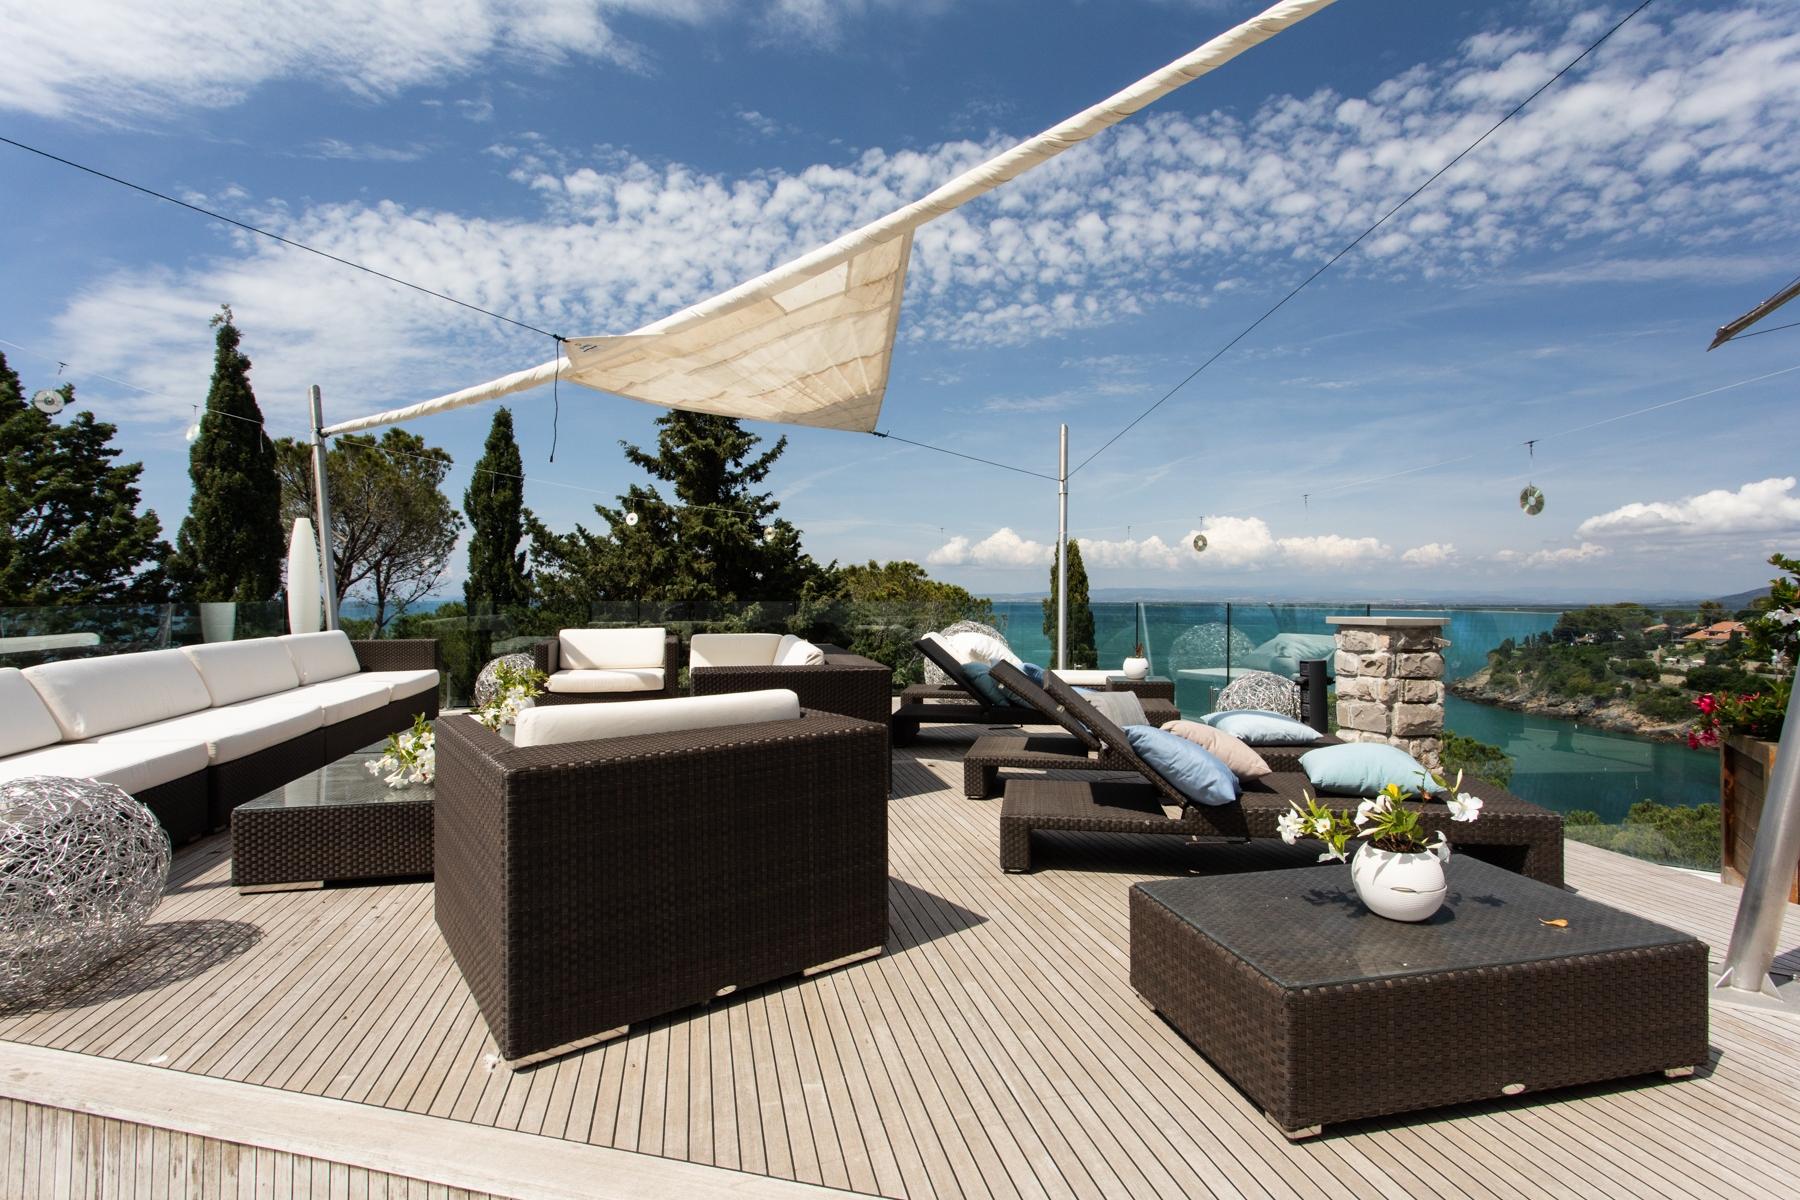 Villa in Vendita a Monte Argentario via costa degli ulivi